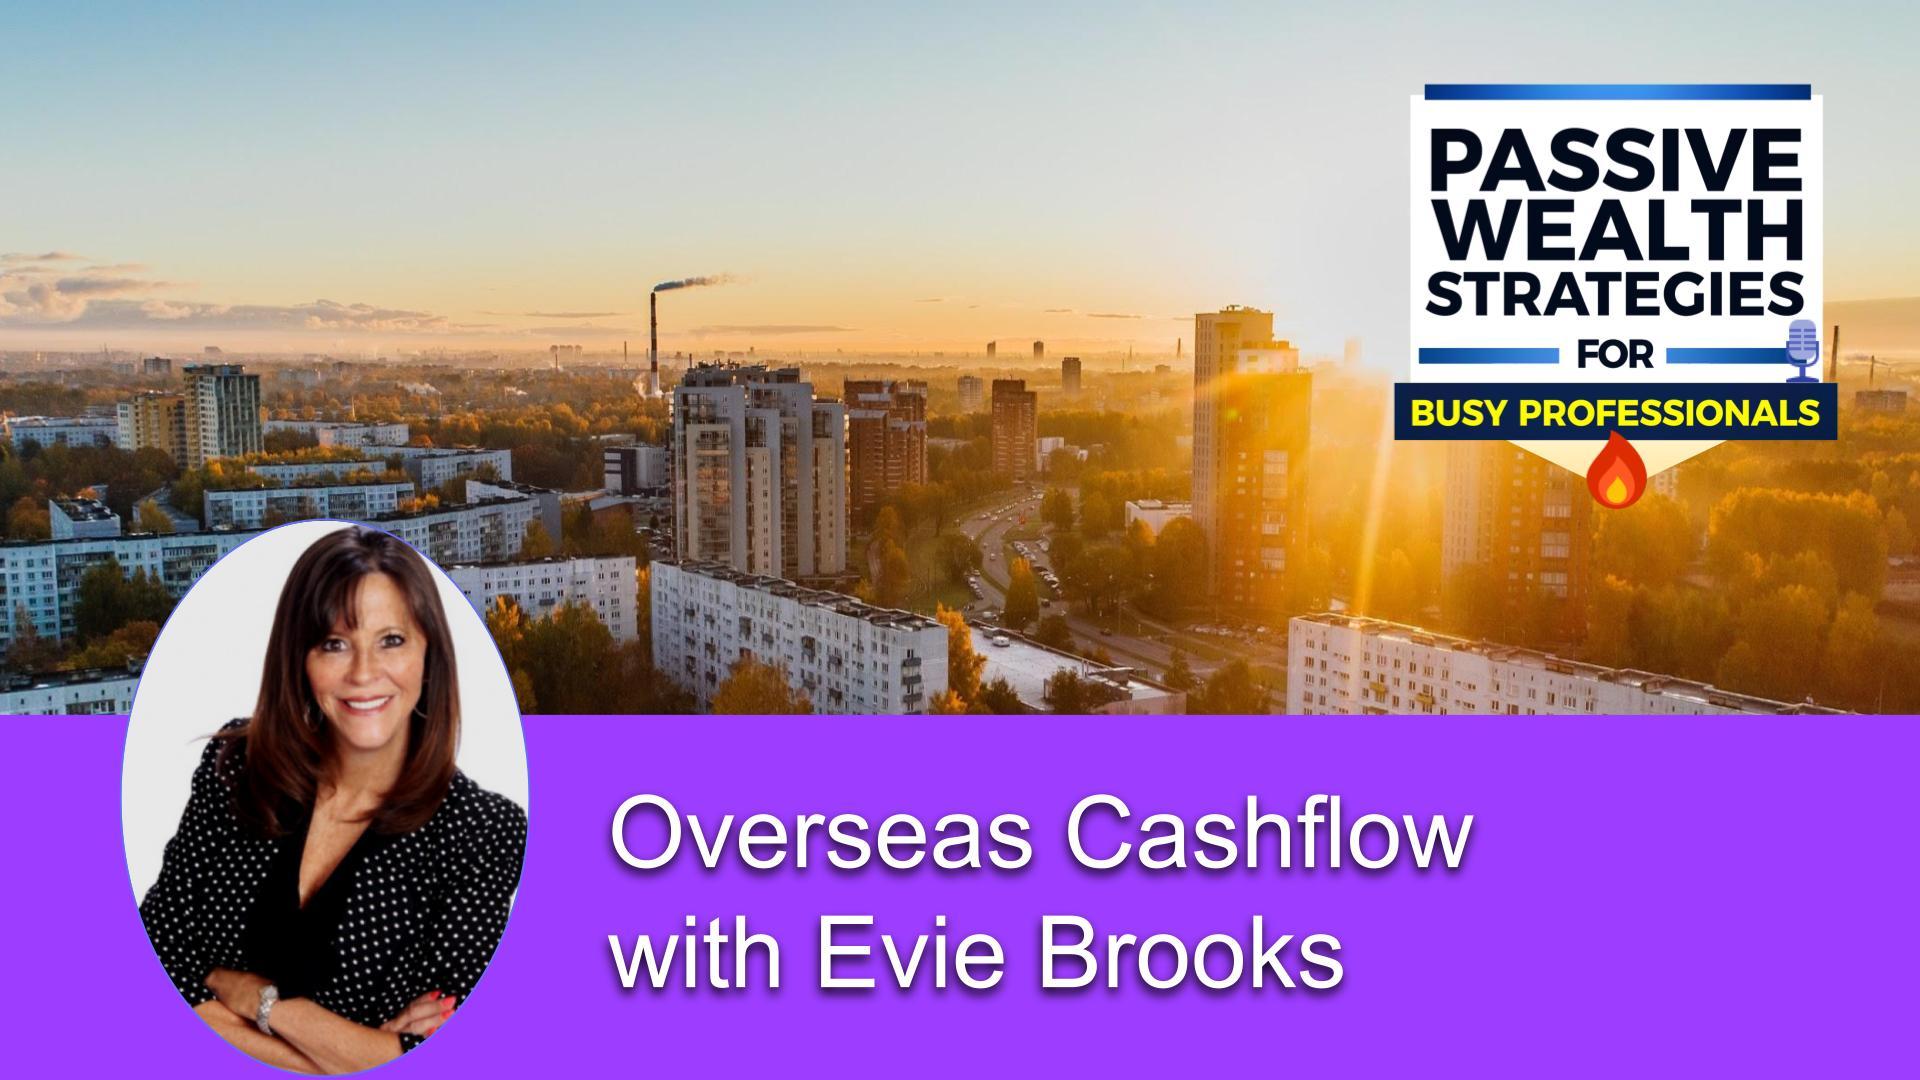 223 Overseas Cashflow with Evie Brooks